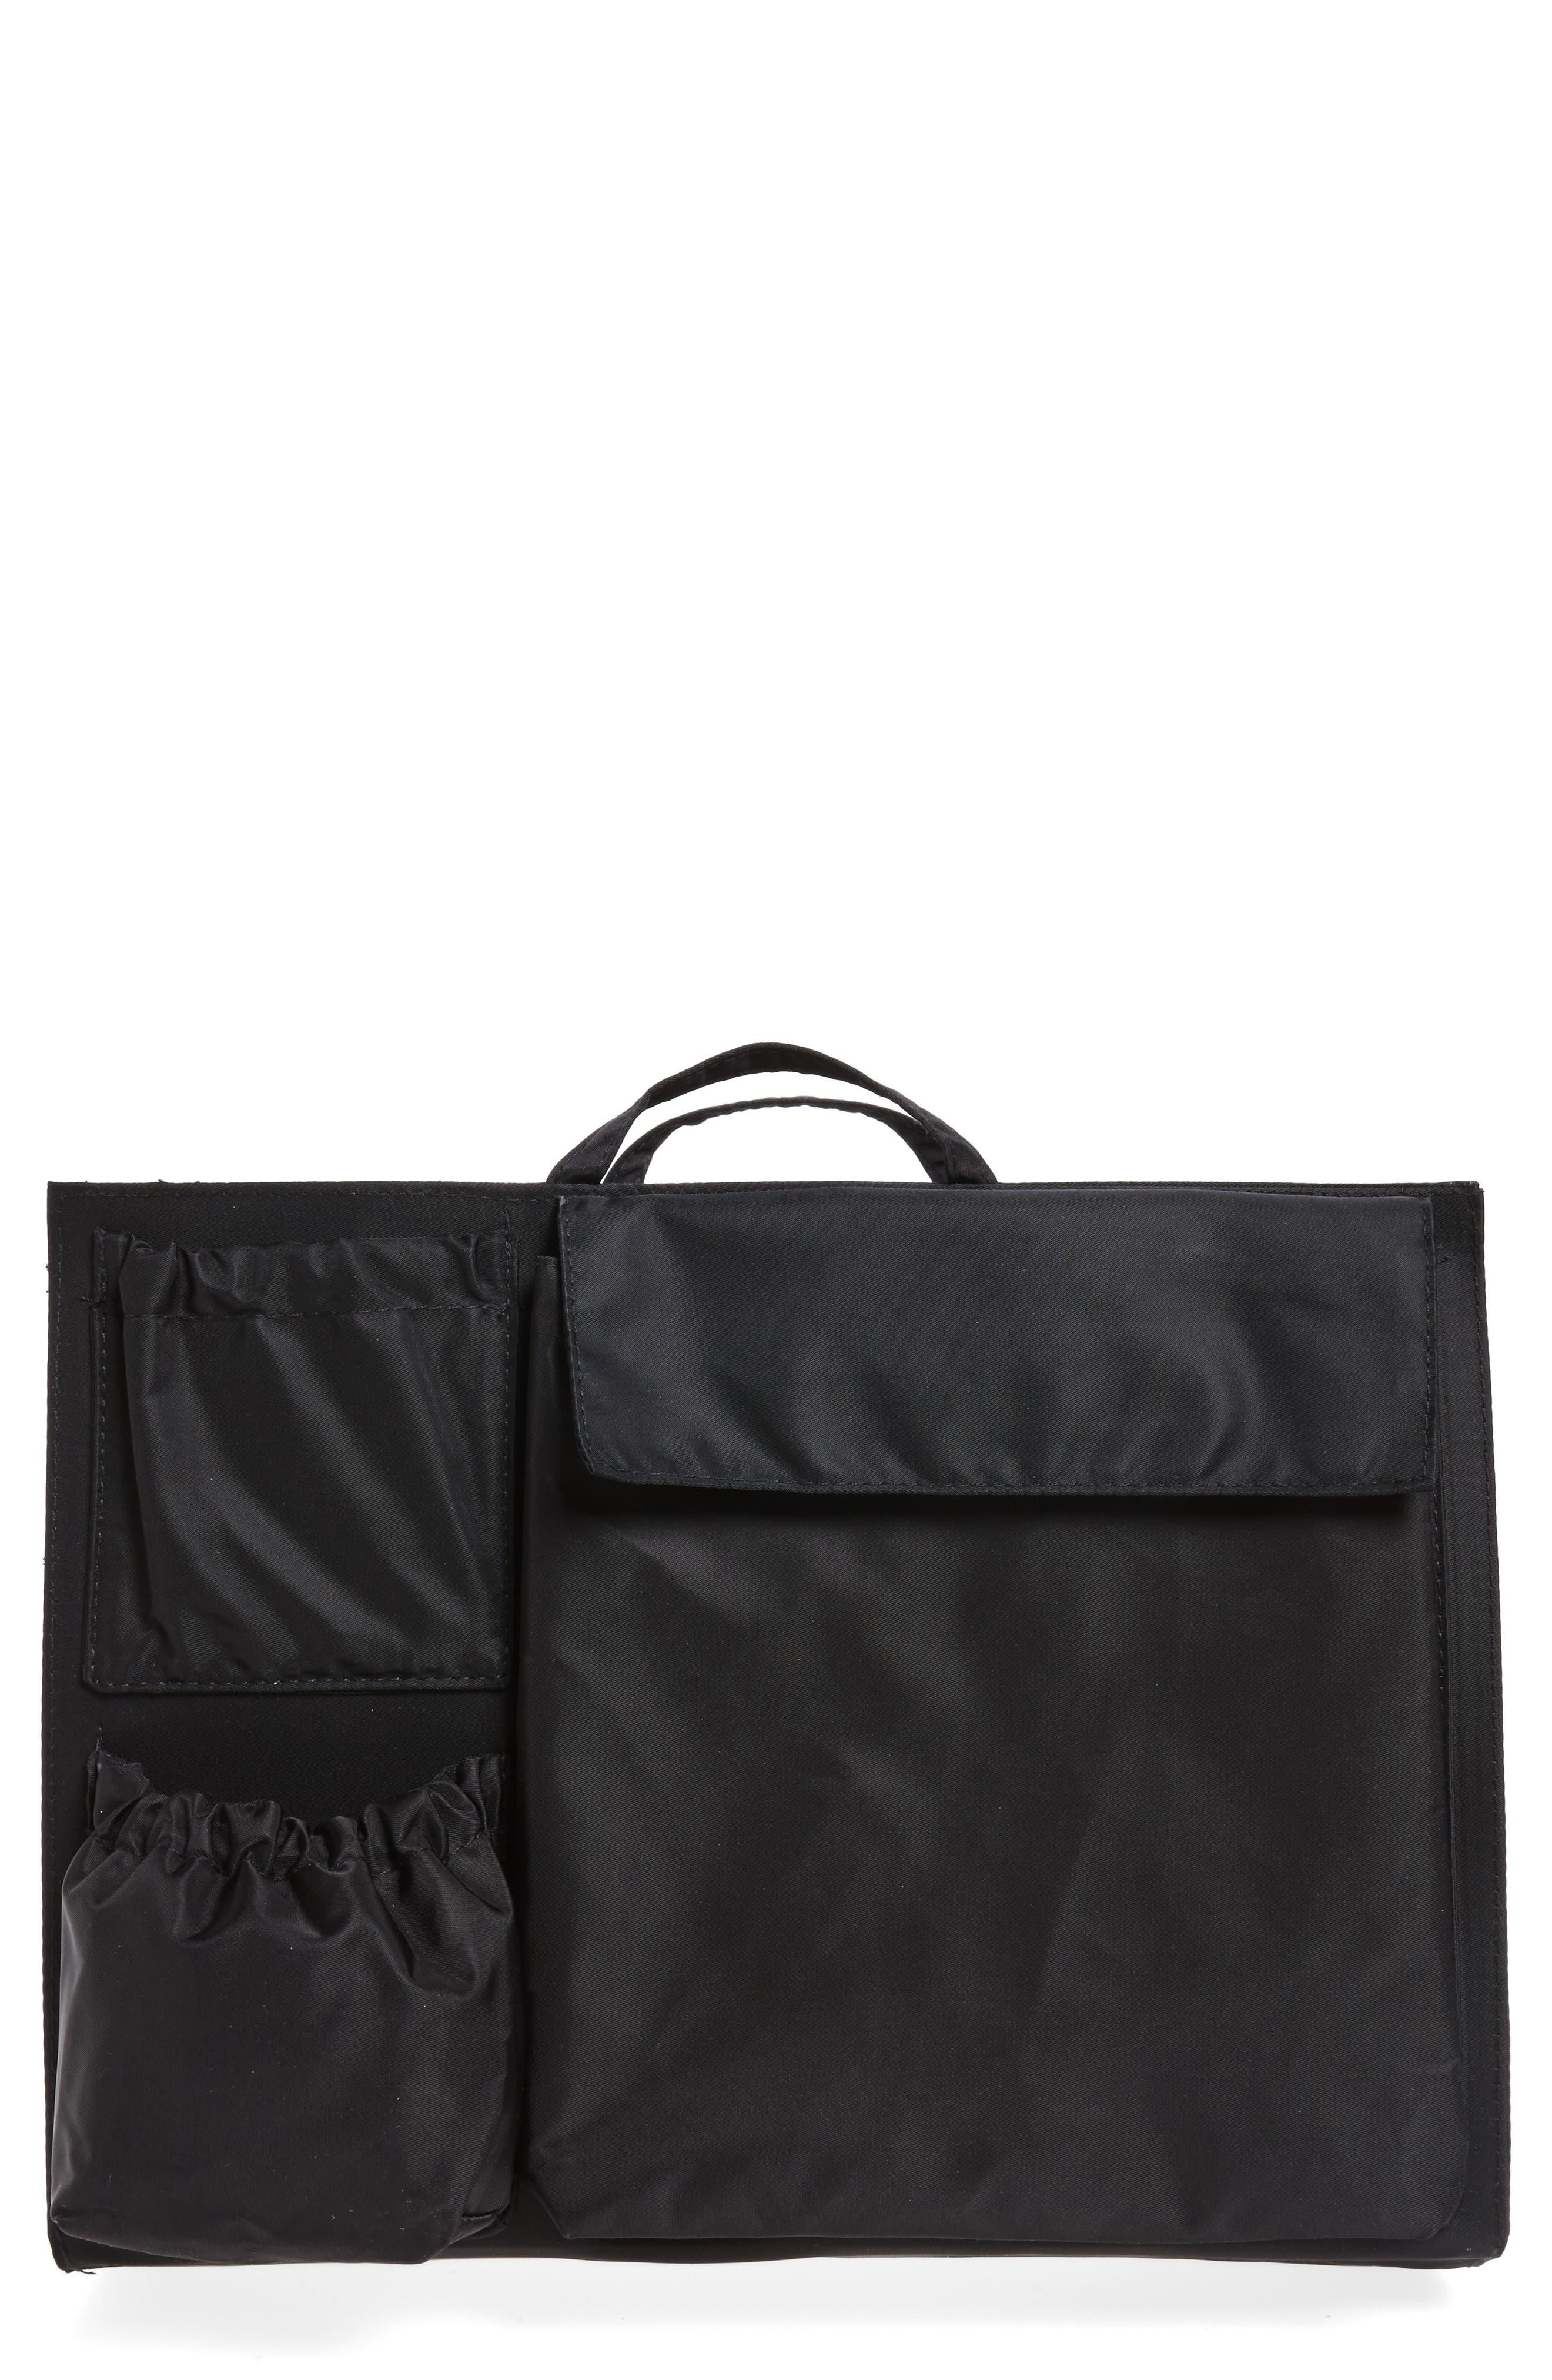 Organization Handbag Insert,                             Main thumbnail 1, color,                             CLASSIC BLACK